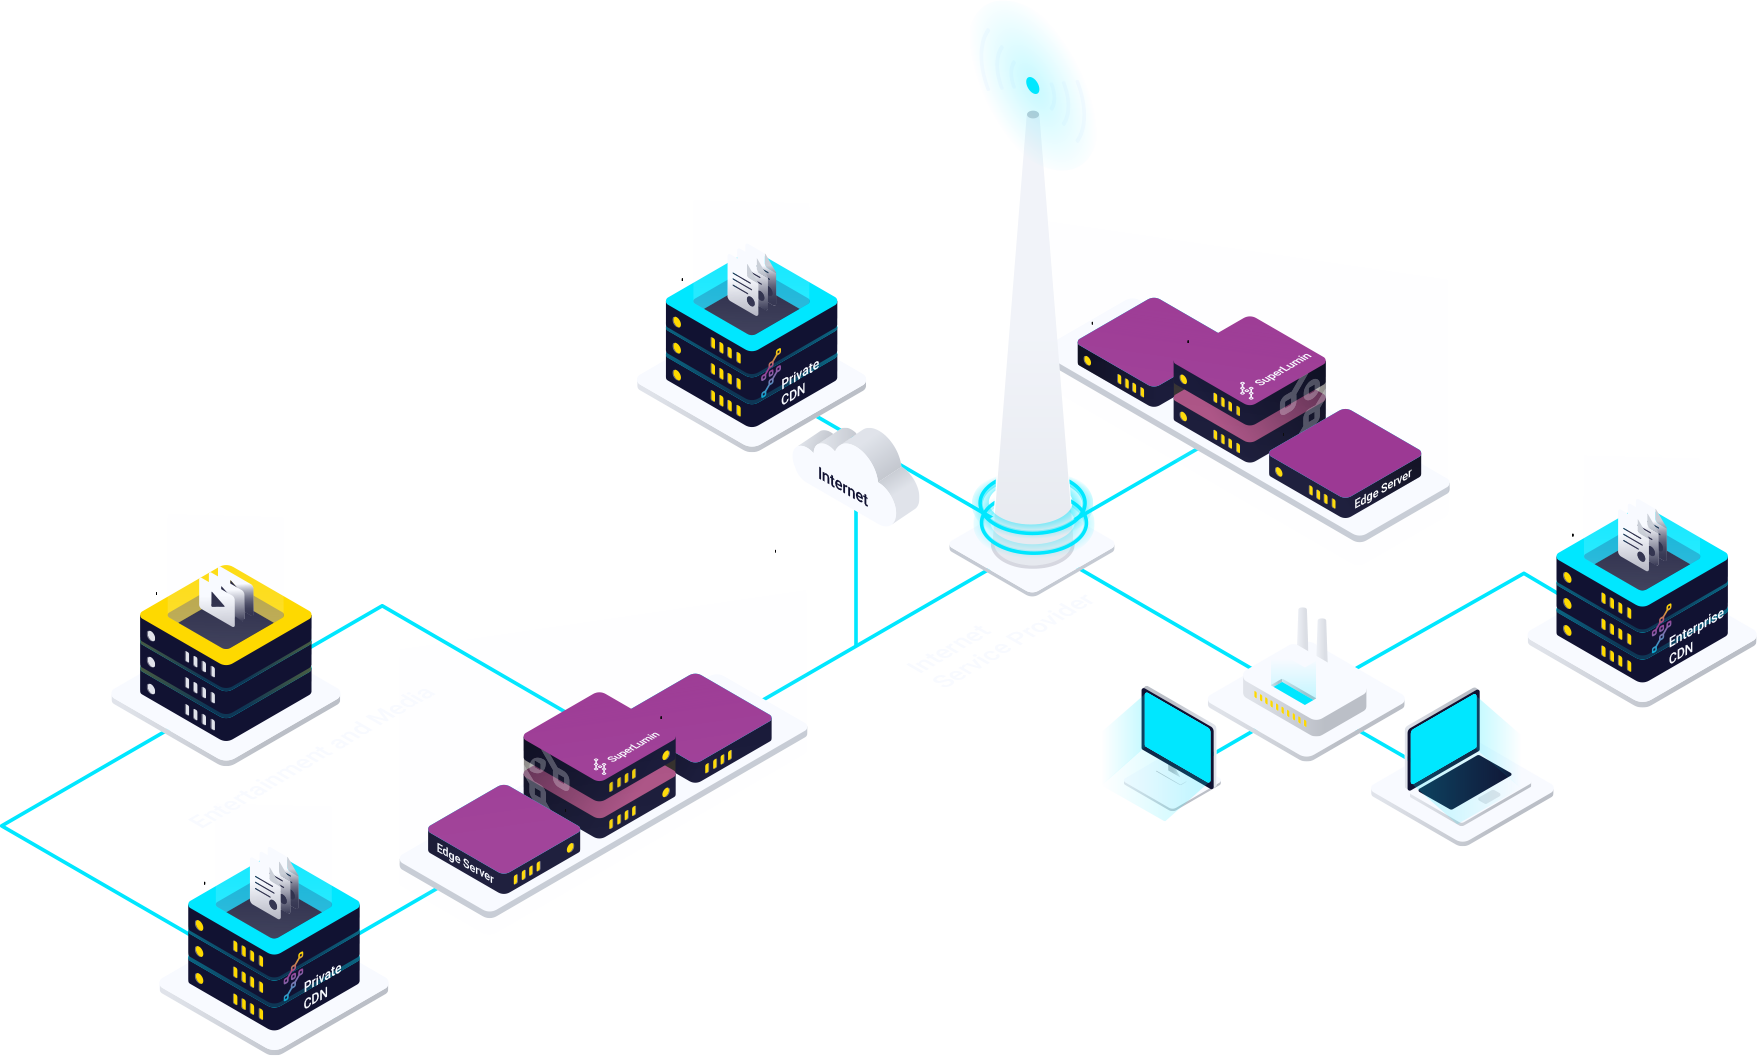 superlumin-diagram